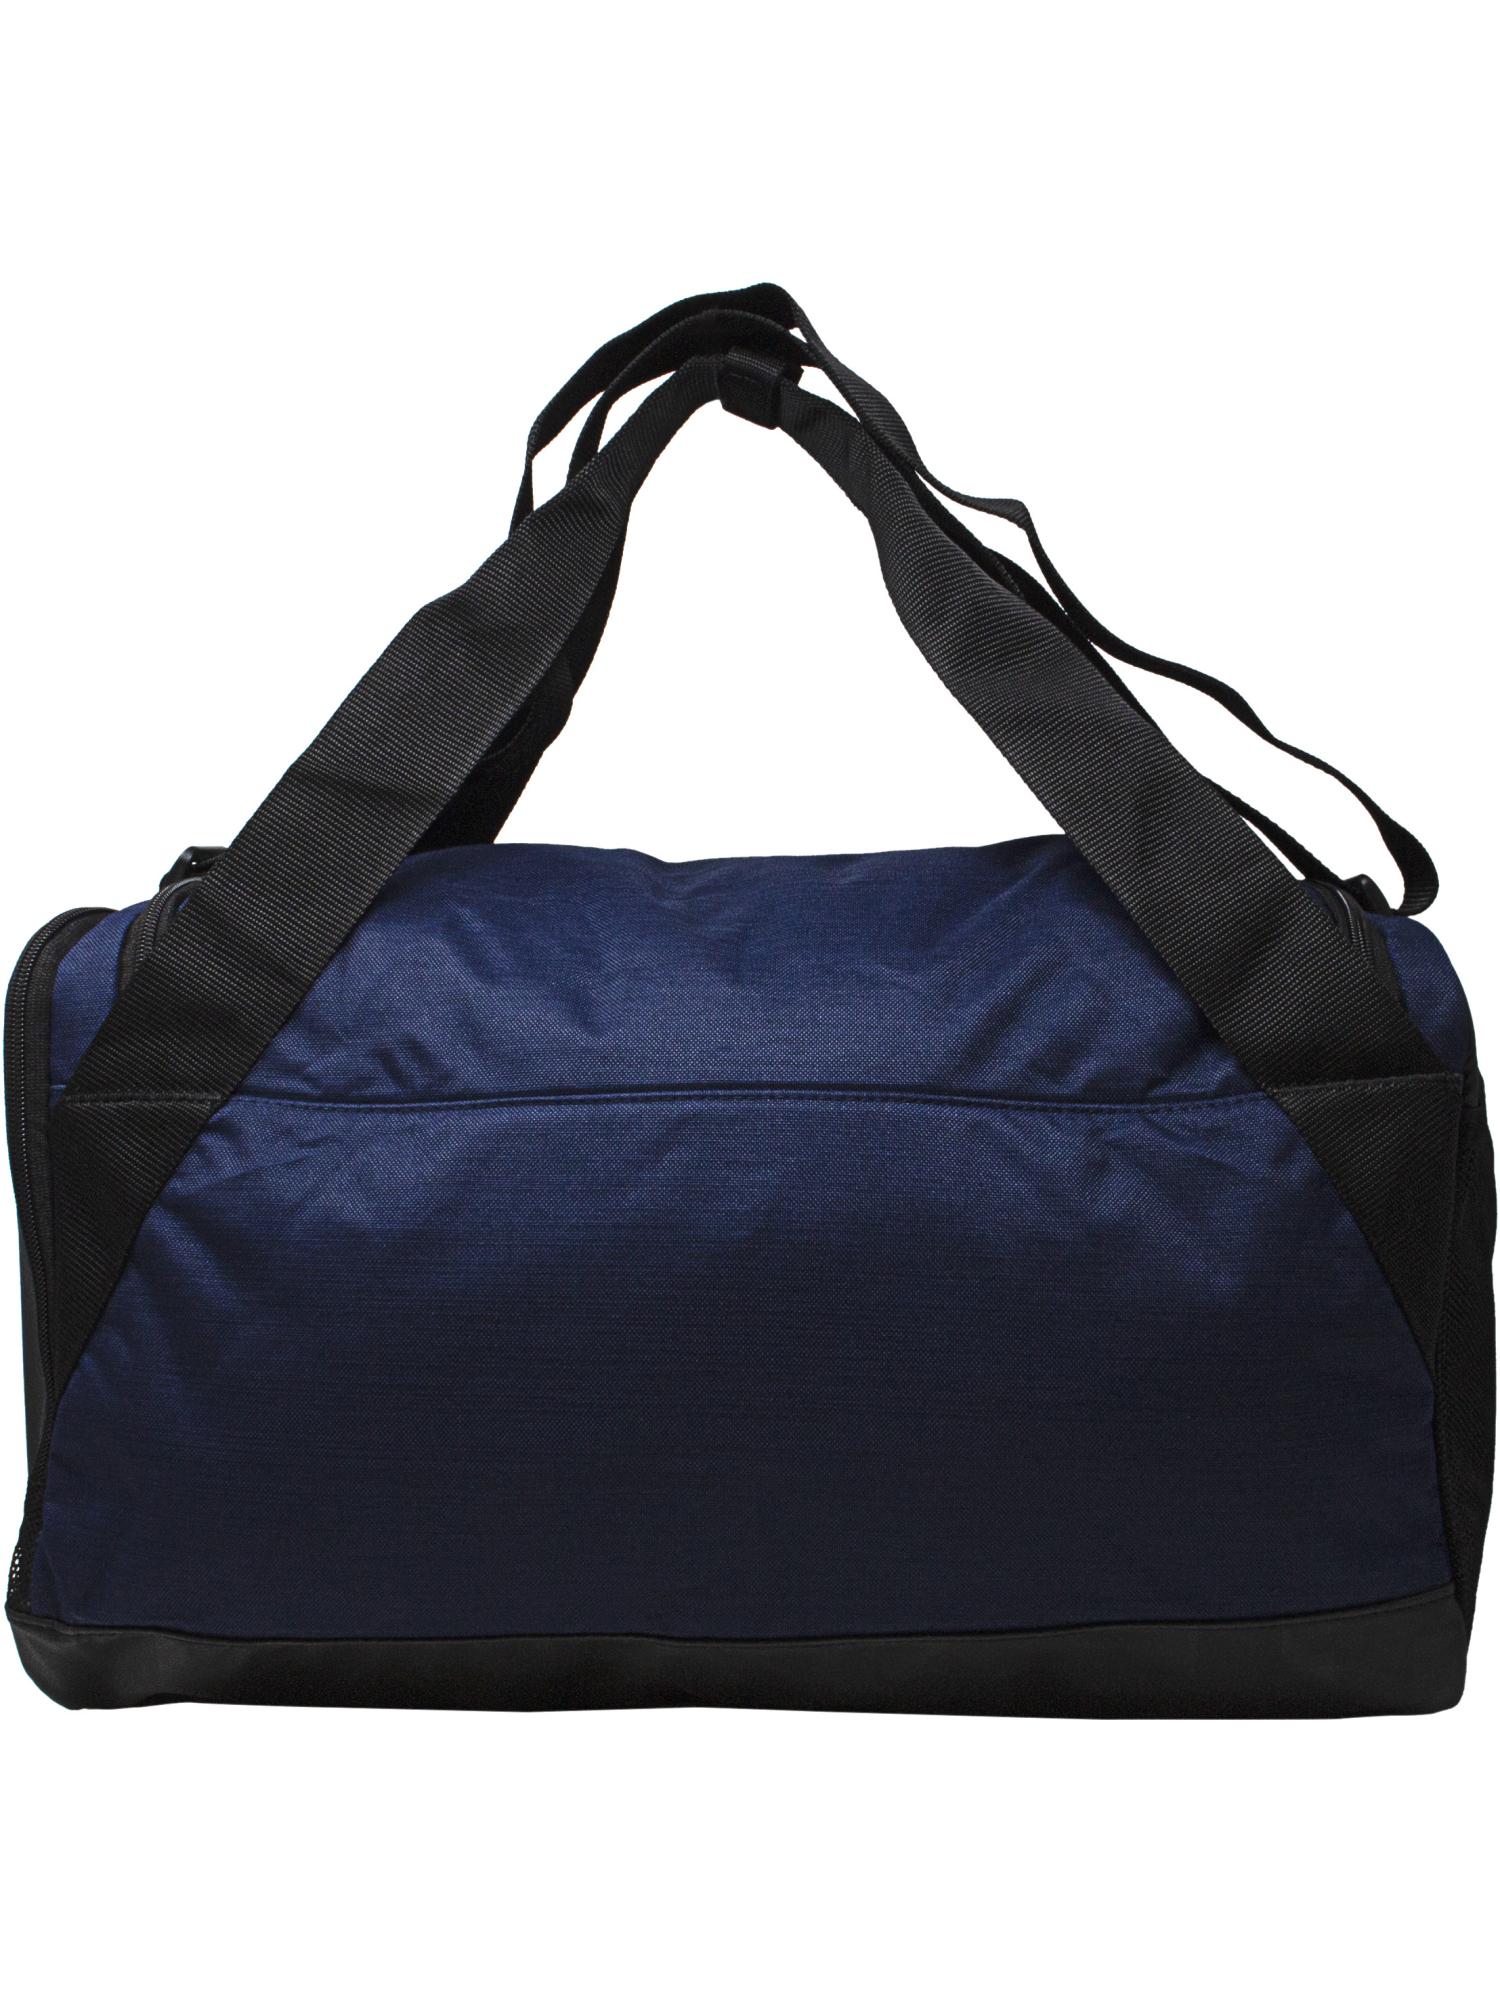 Nike Brasilia Small Duffel Polyester Duffle Bag Hobo